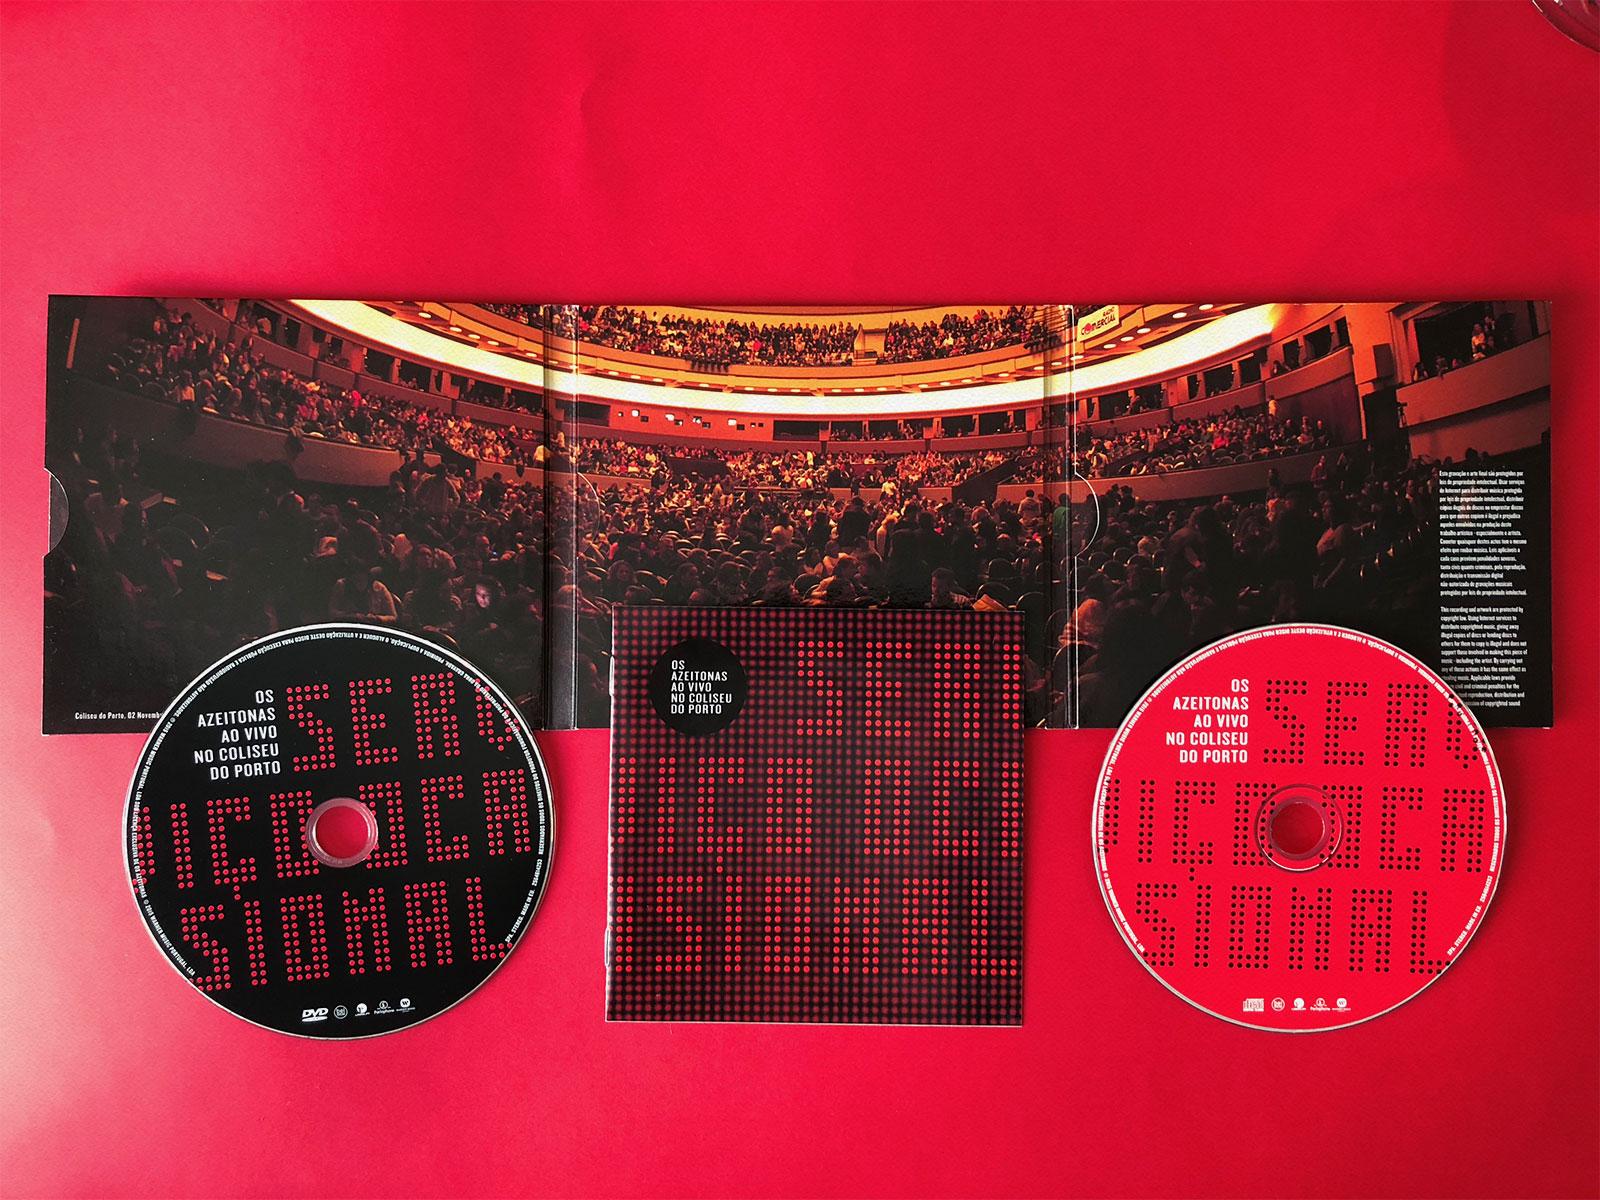 OS AZEITONAS - DVD - 5